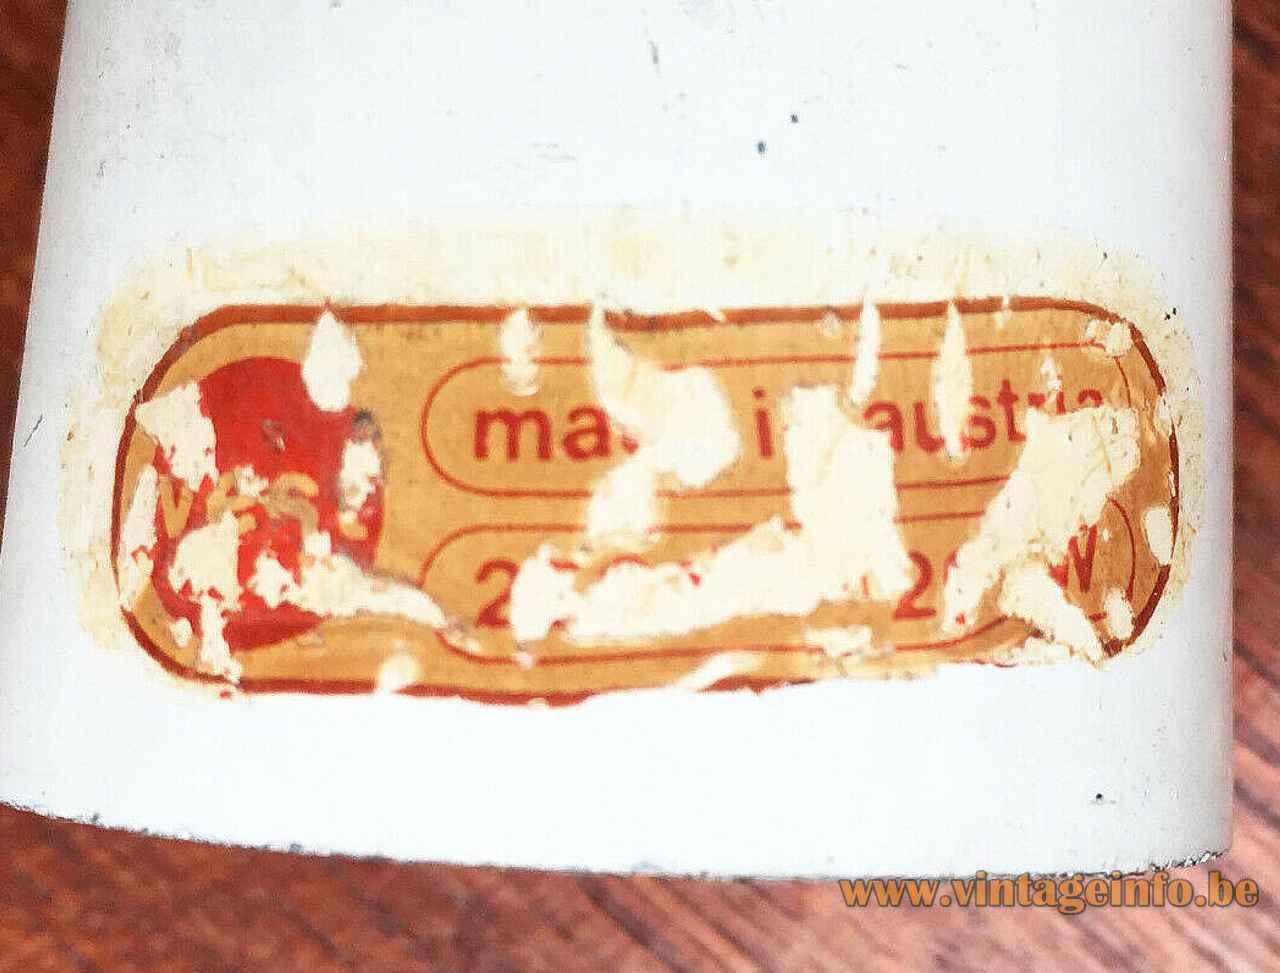 Vest Rhythmik pendant lamp 1968 design: Milanda Havlová paper label & logo 1960s 1970s Austria